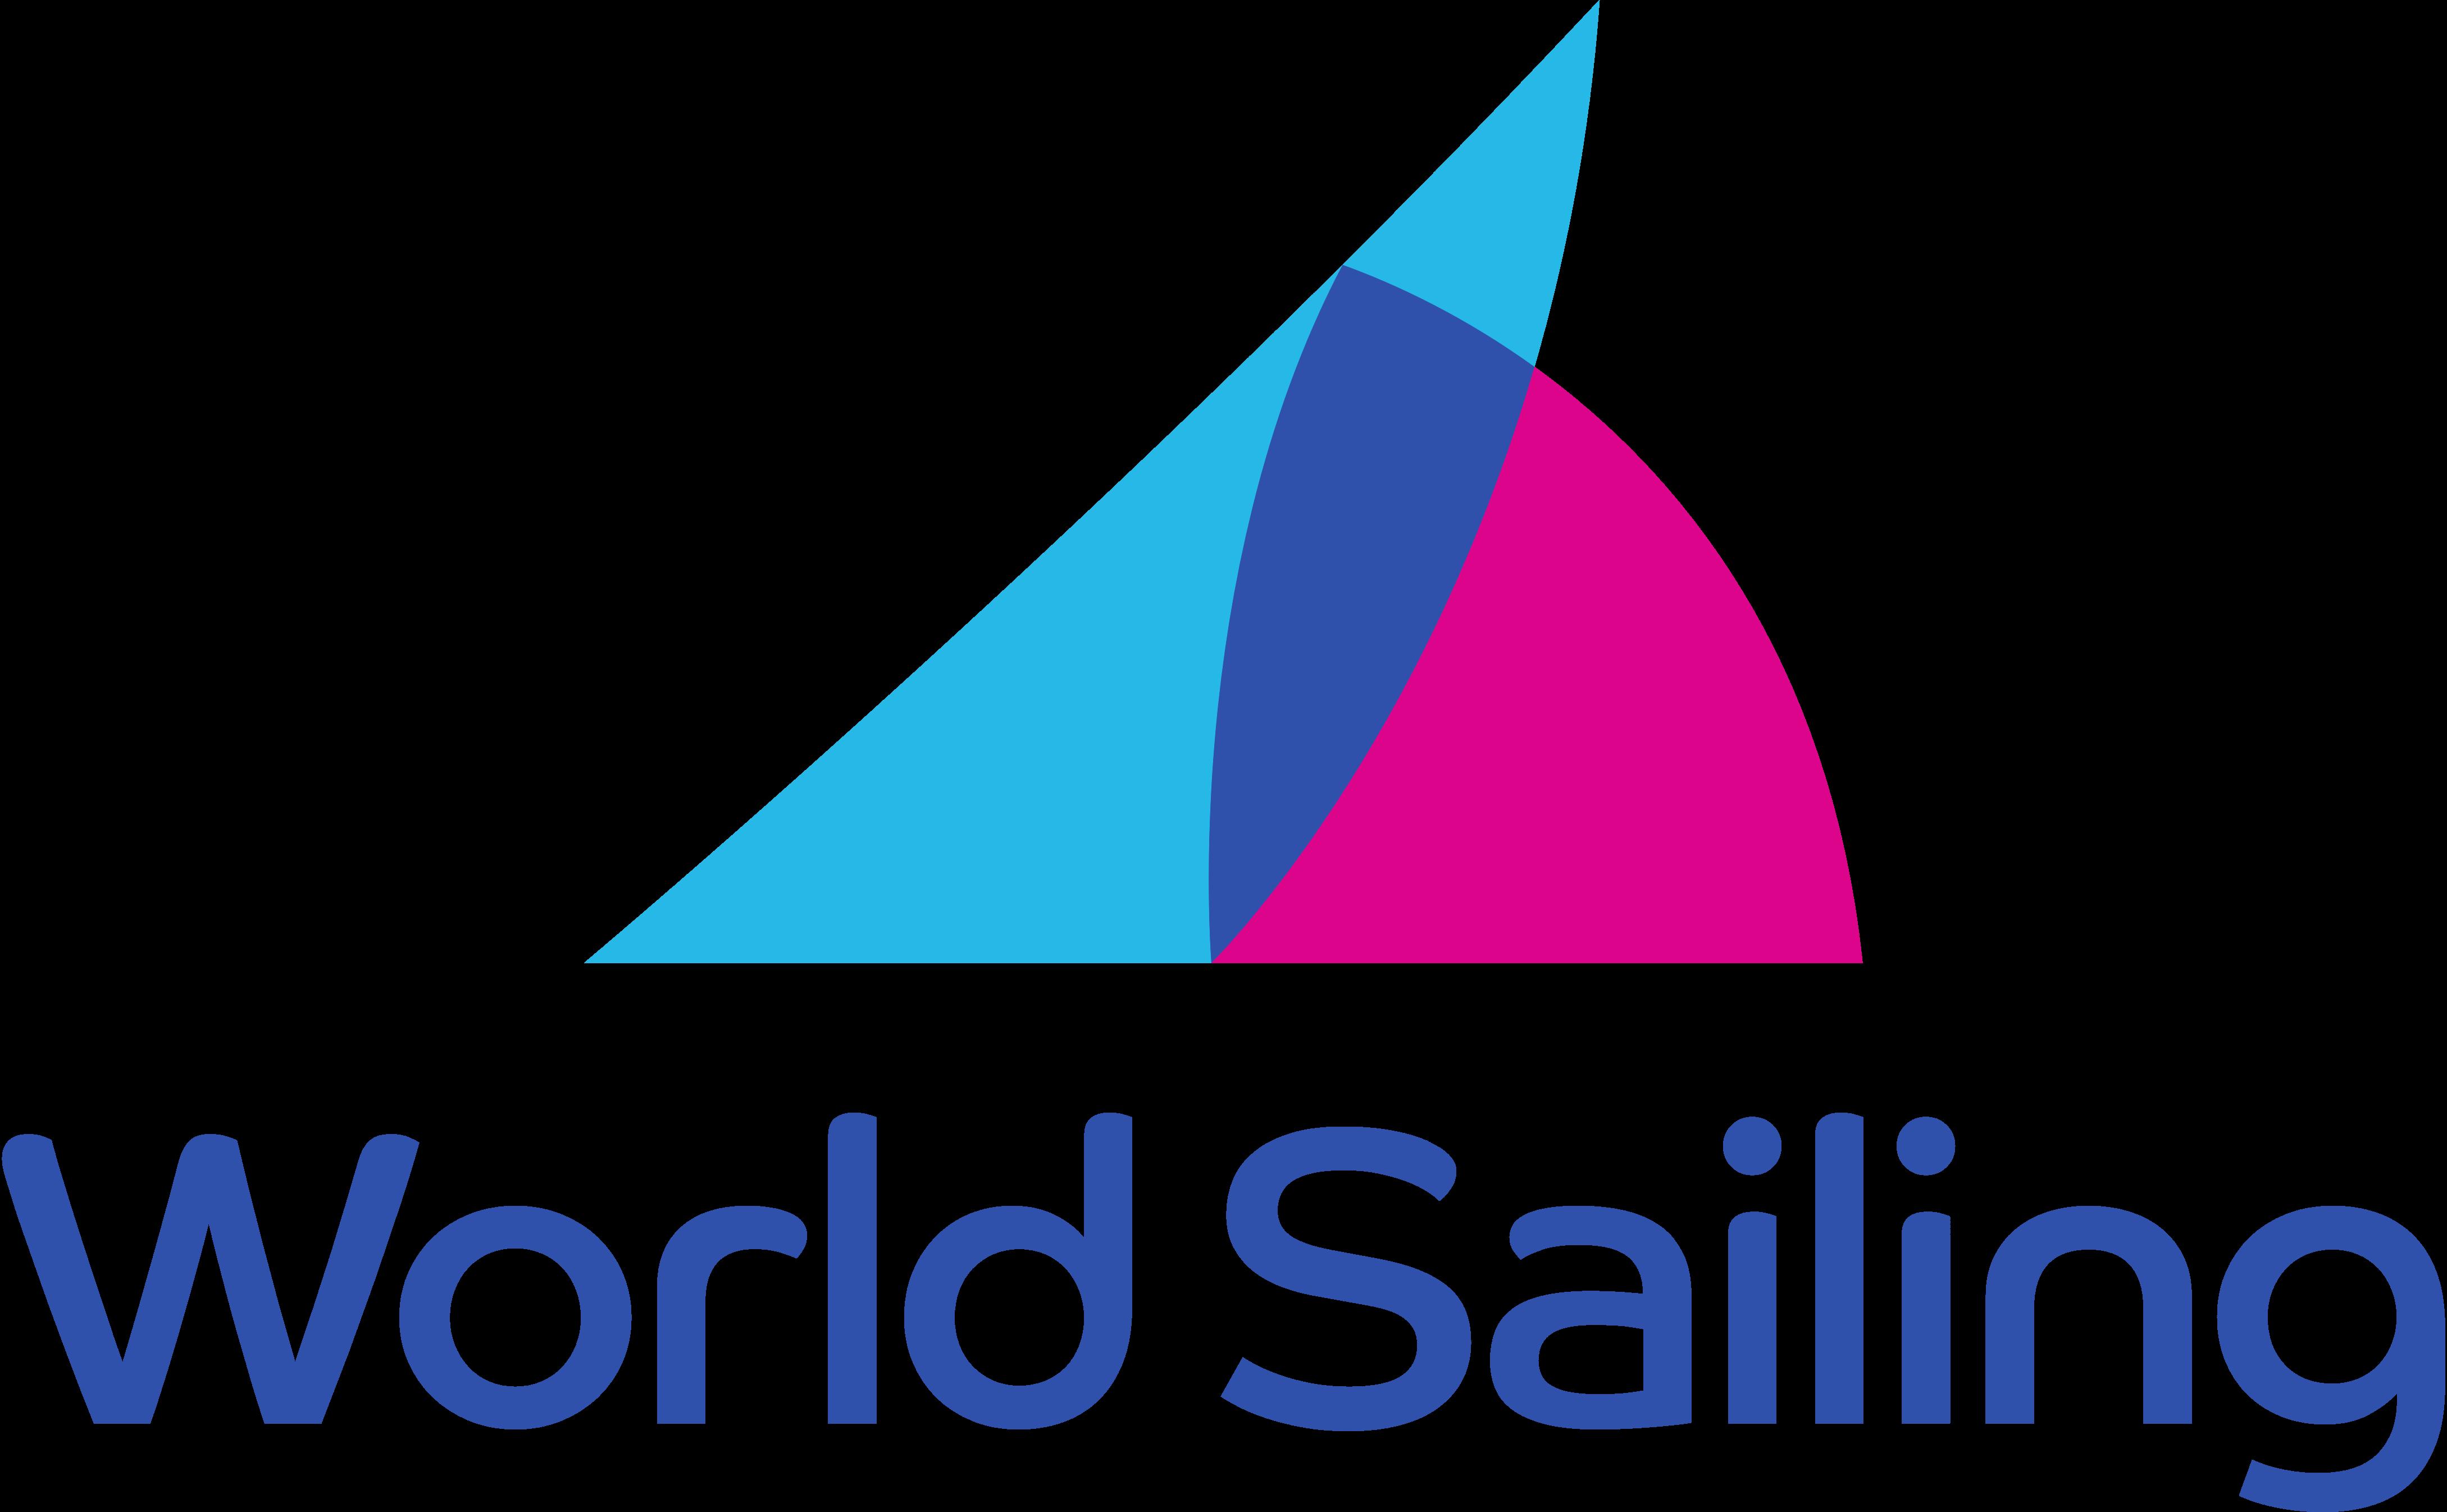 World Sailing – Logos Download